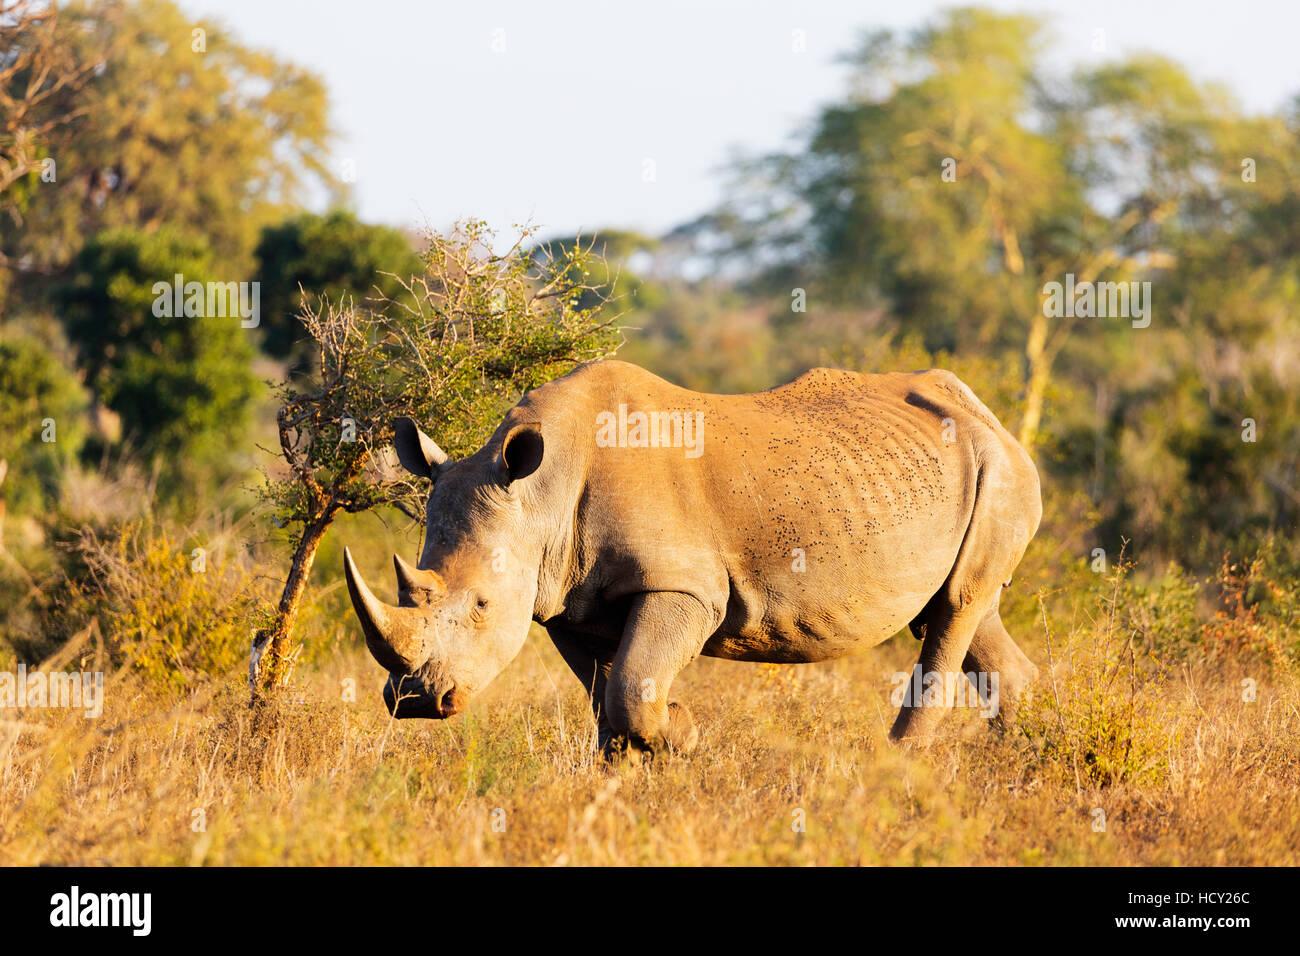 White rhino (Ceratotherium simum), Kruger National Park, South Africa, Africa Stock Photo